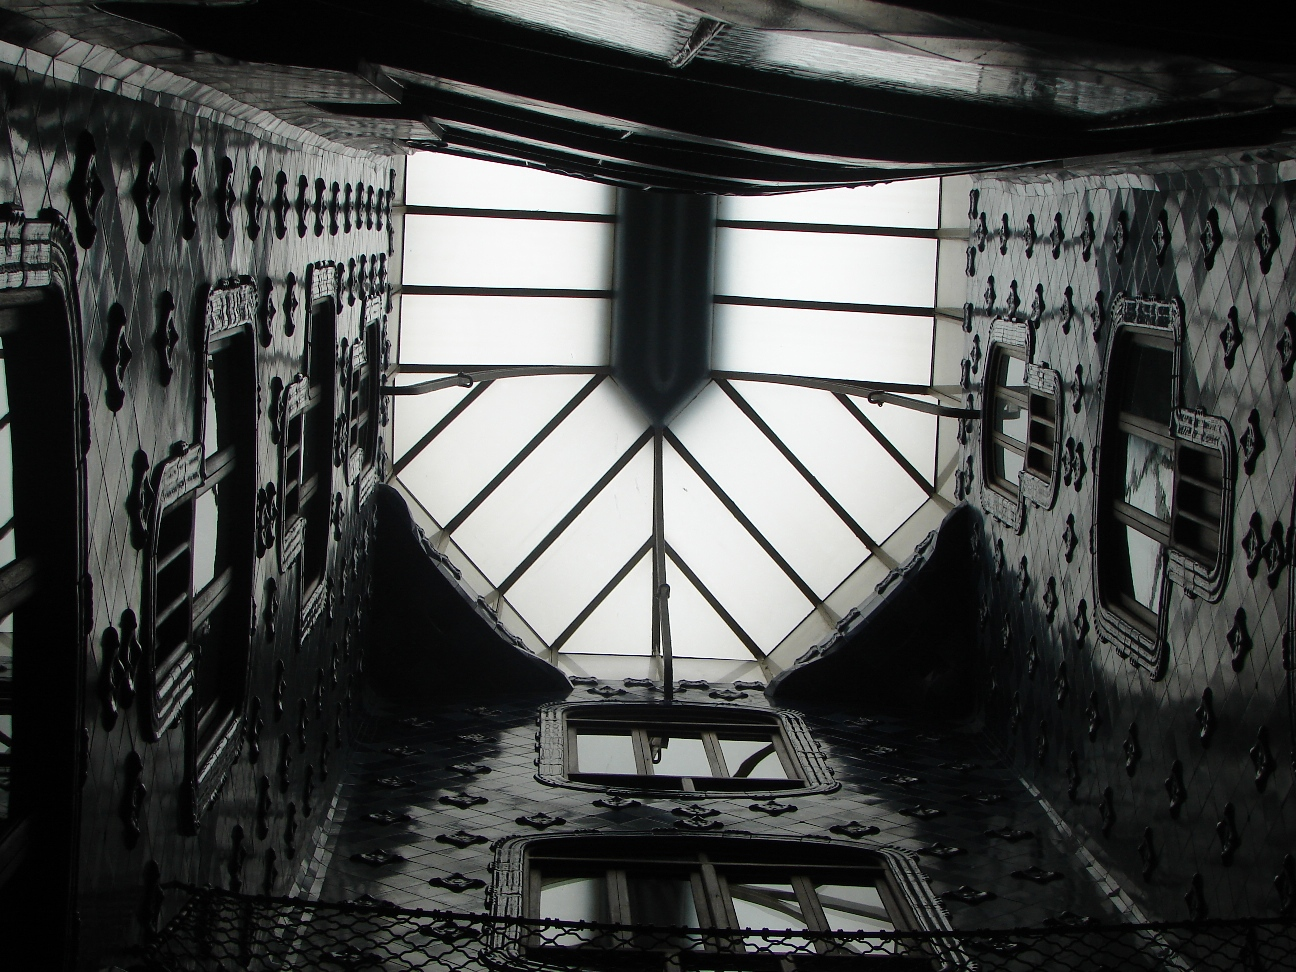 Casa Batlló - Atrium